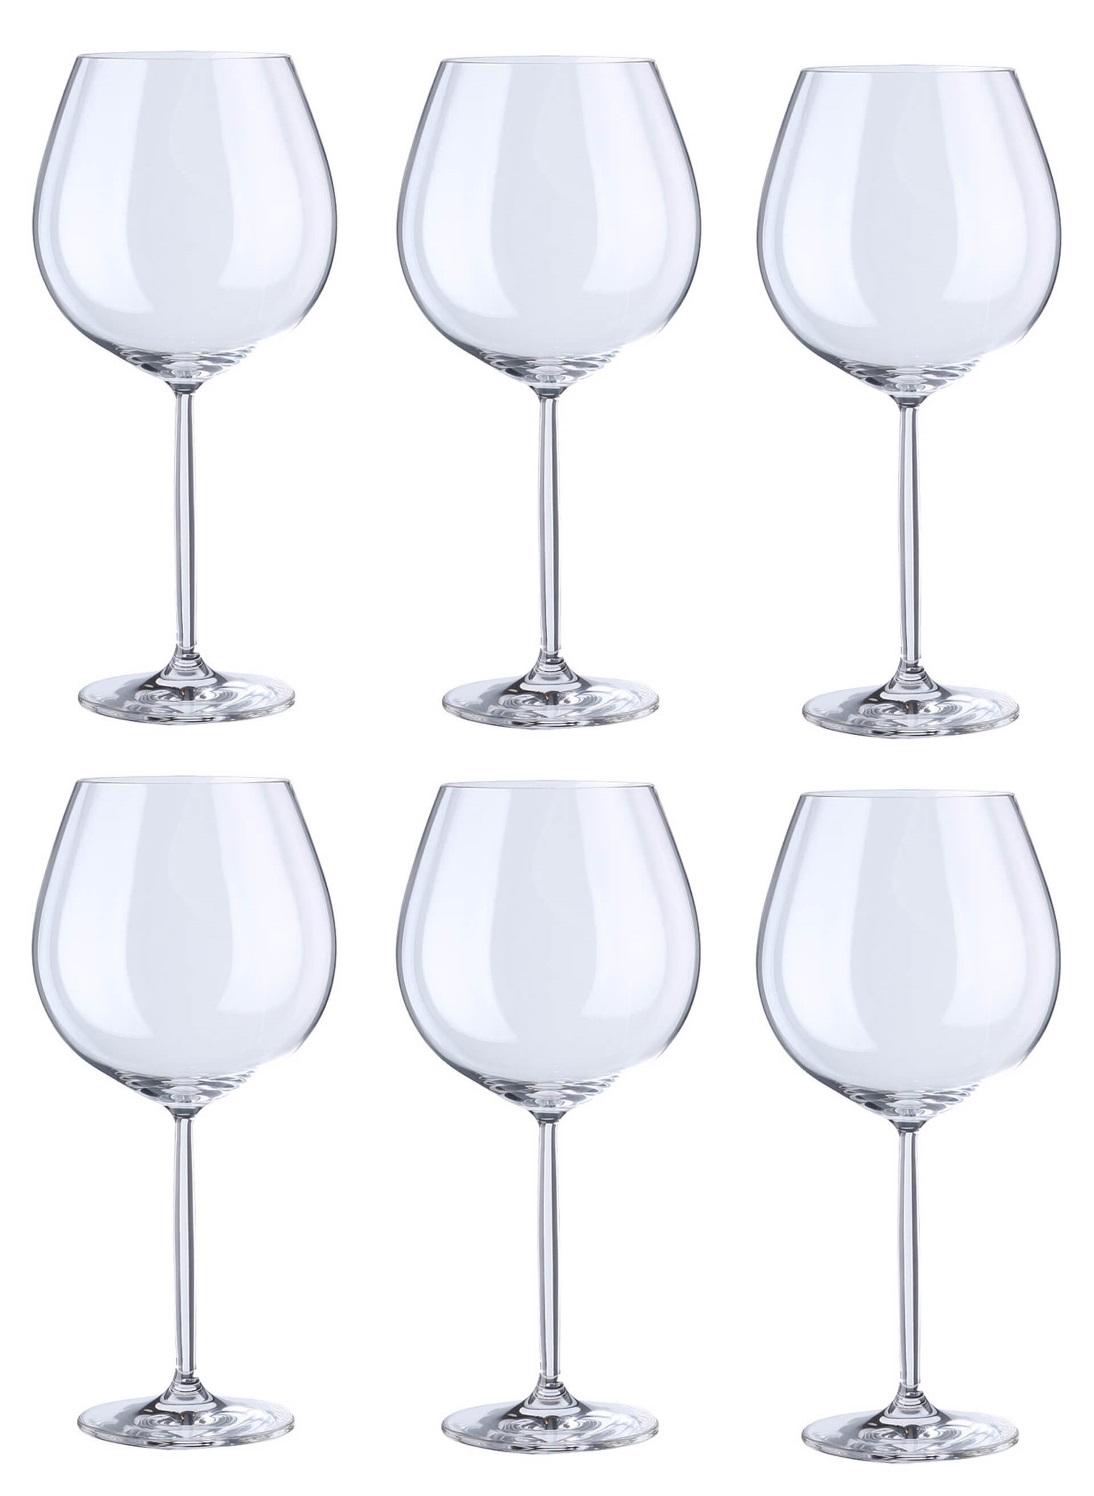 Онлайн каталог PROMENU: Набор бокалов для красного вина Burgundy Schott Zwiesel Diva, объем 0,839 л, 6 шт.                               104103_6шт